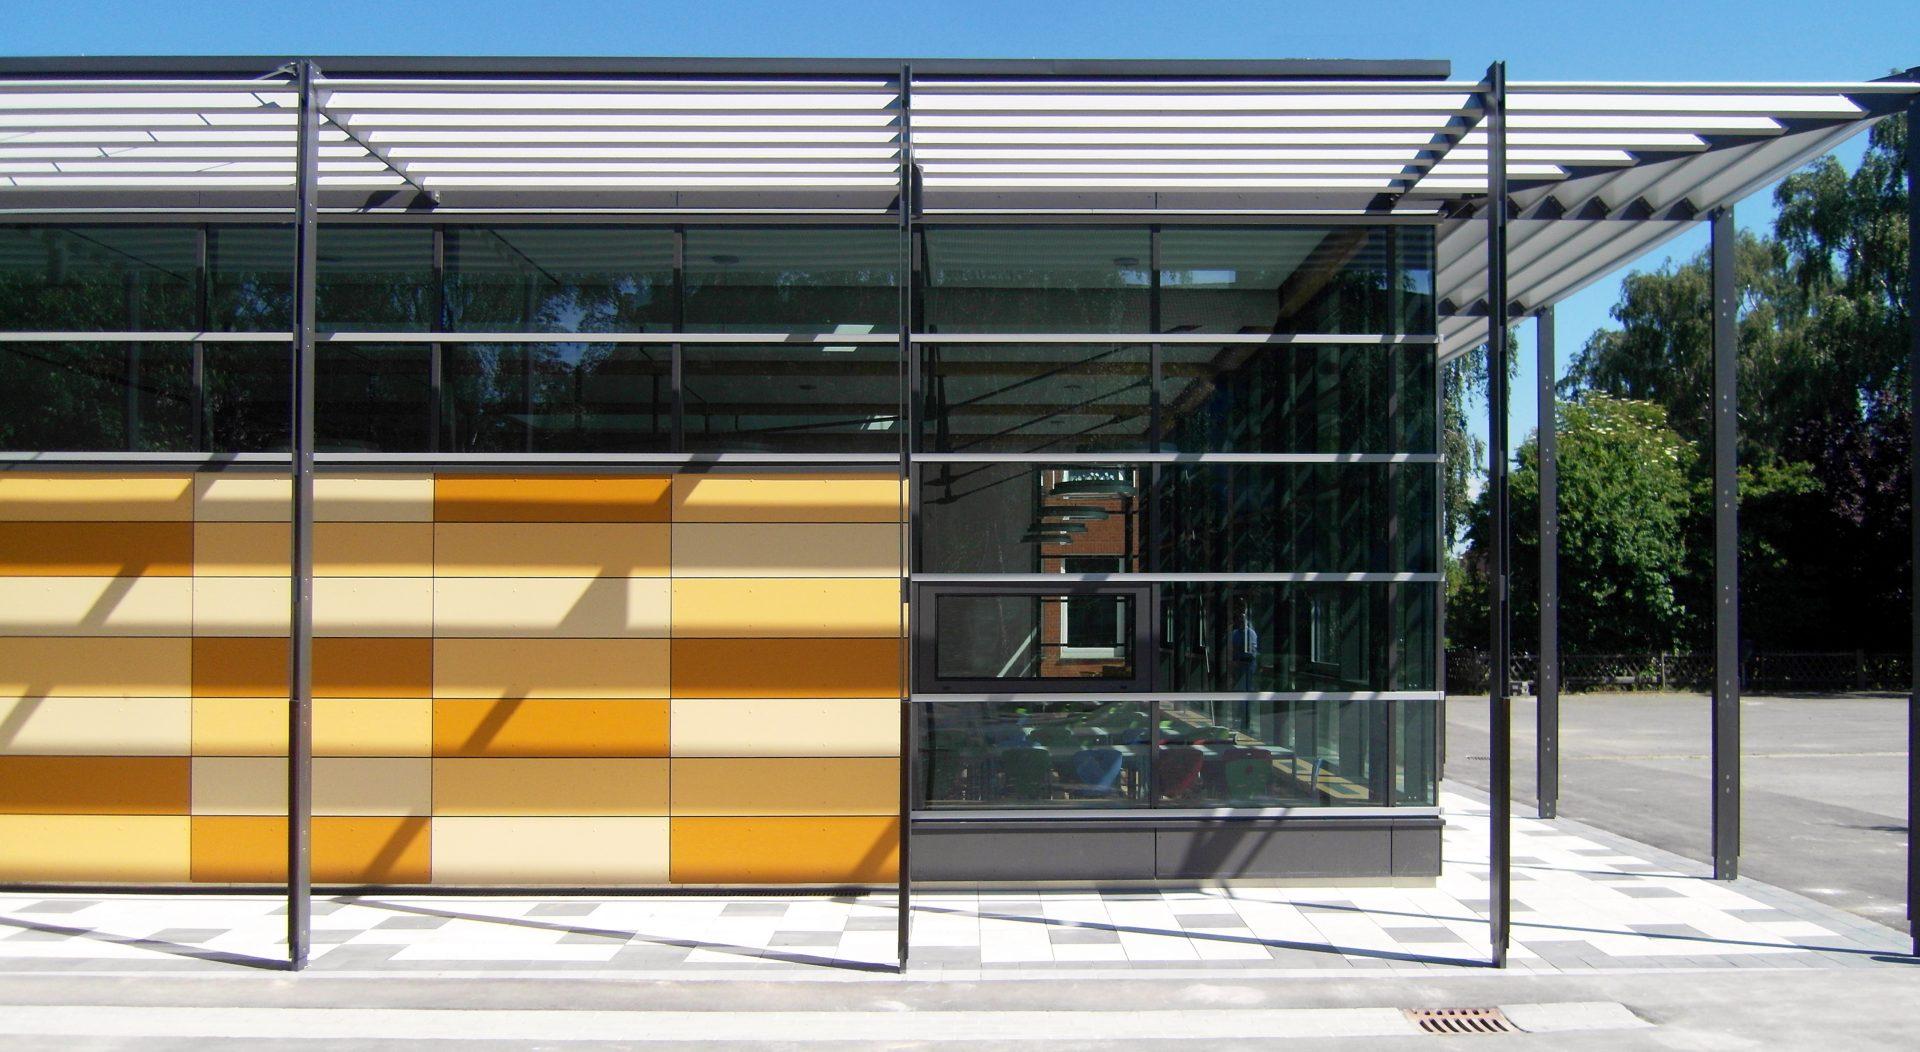 https://www.stricker-architekten.de/projekte/neubau-mensa-grundschule-am-sonnenbrink-stadt-stadthagen/